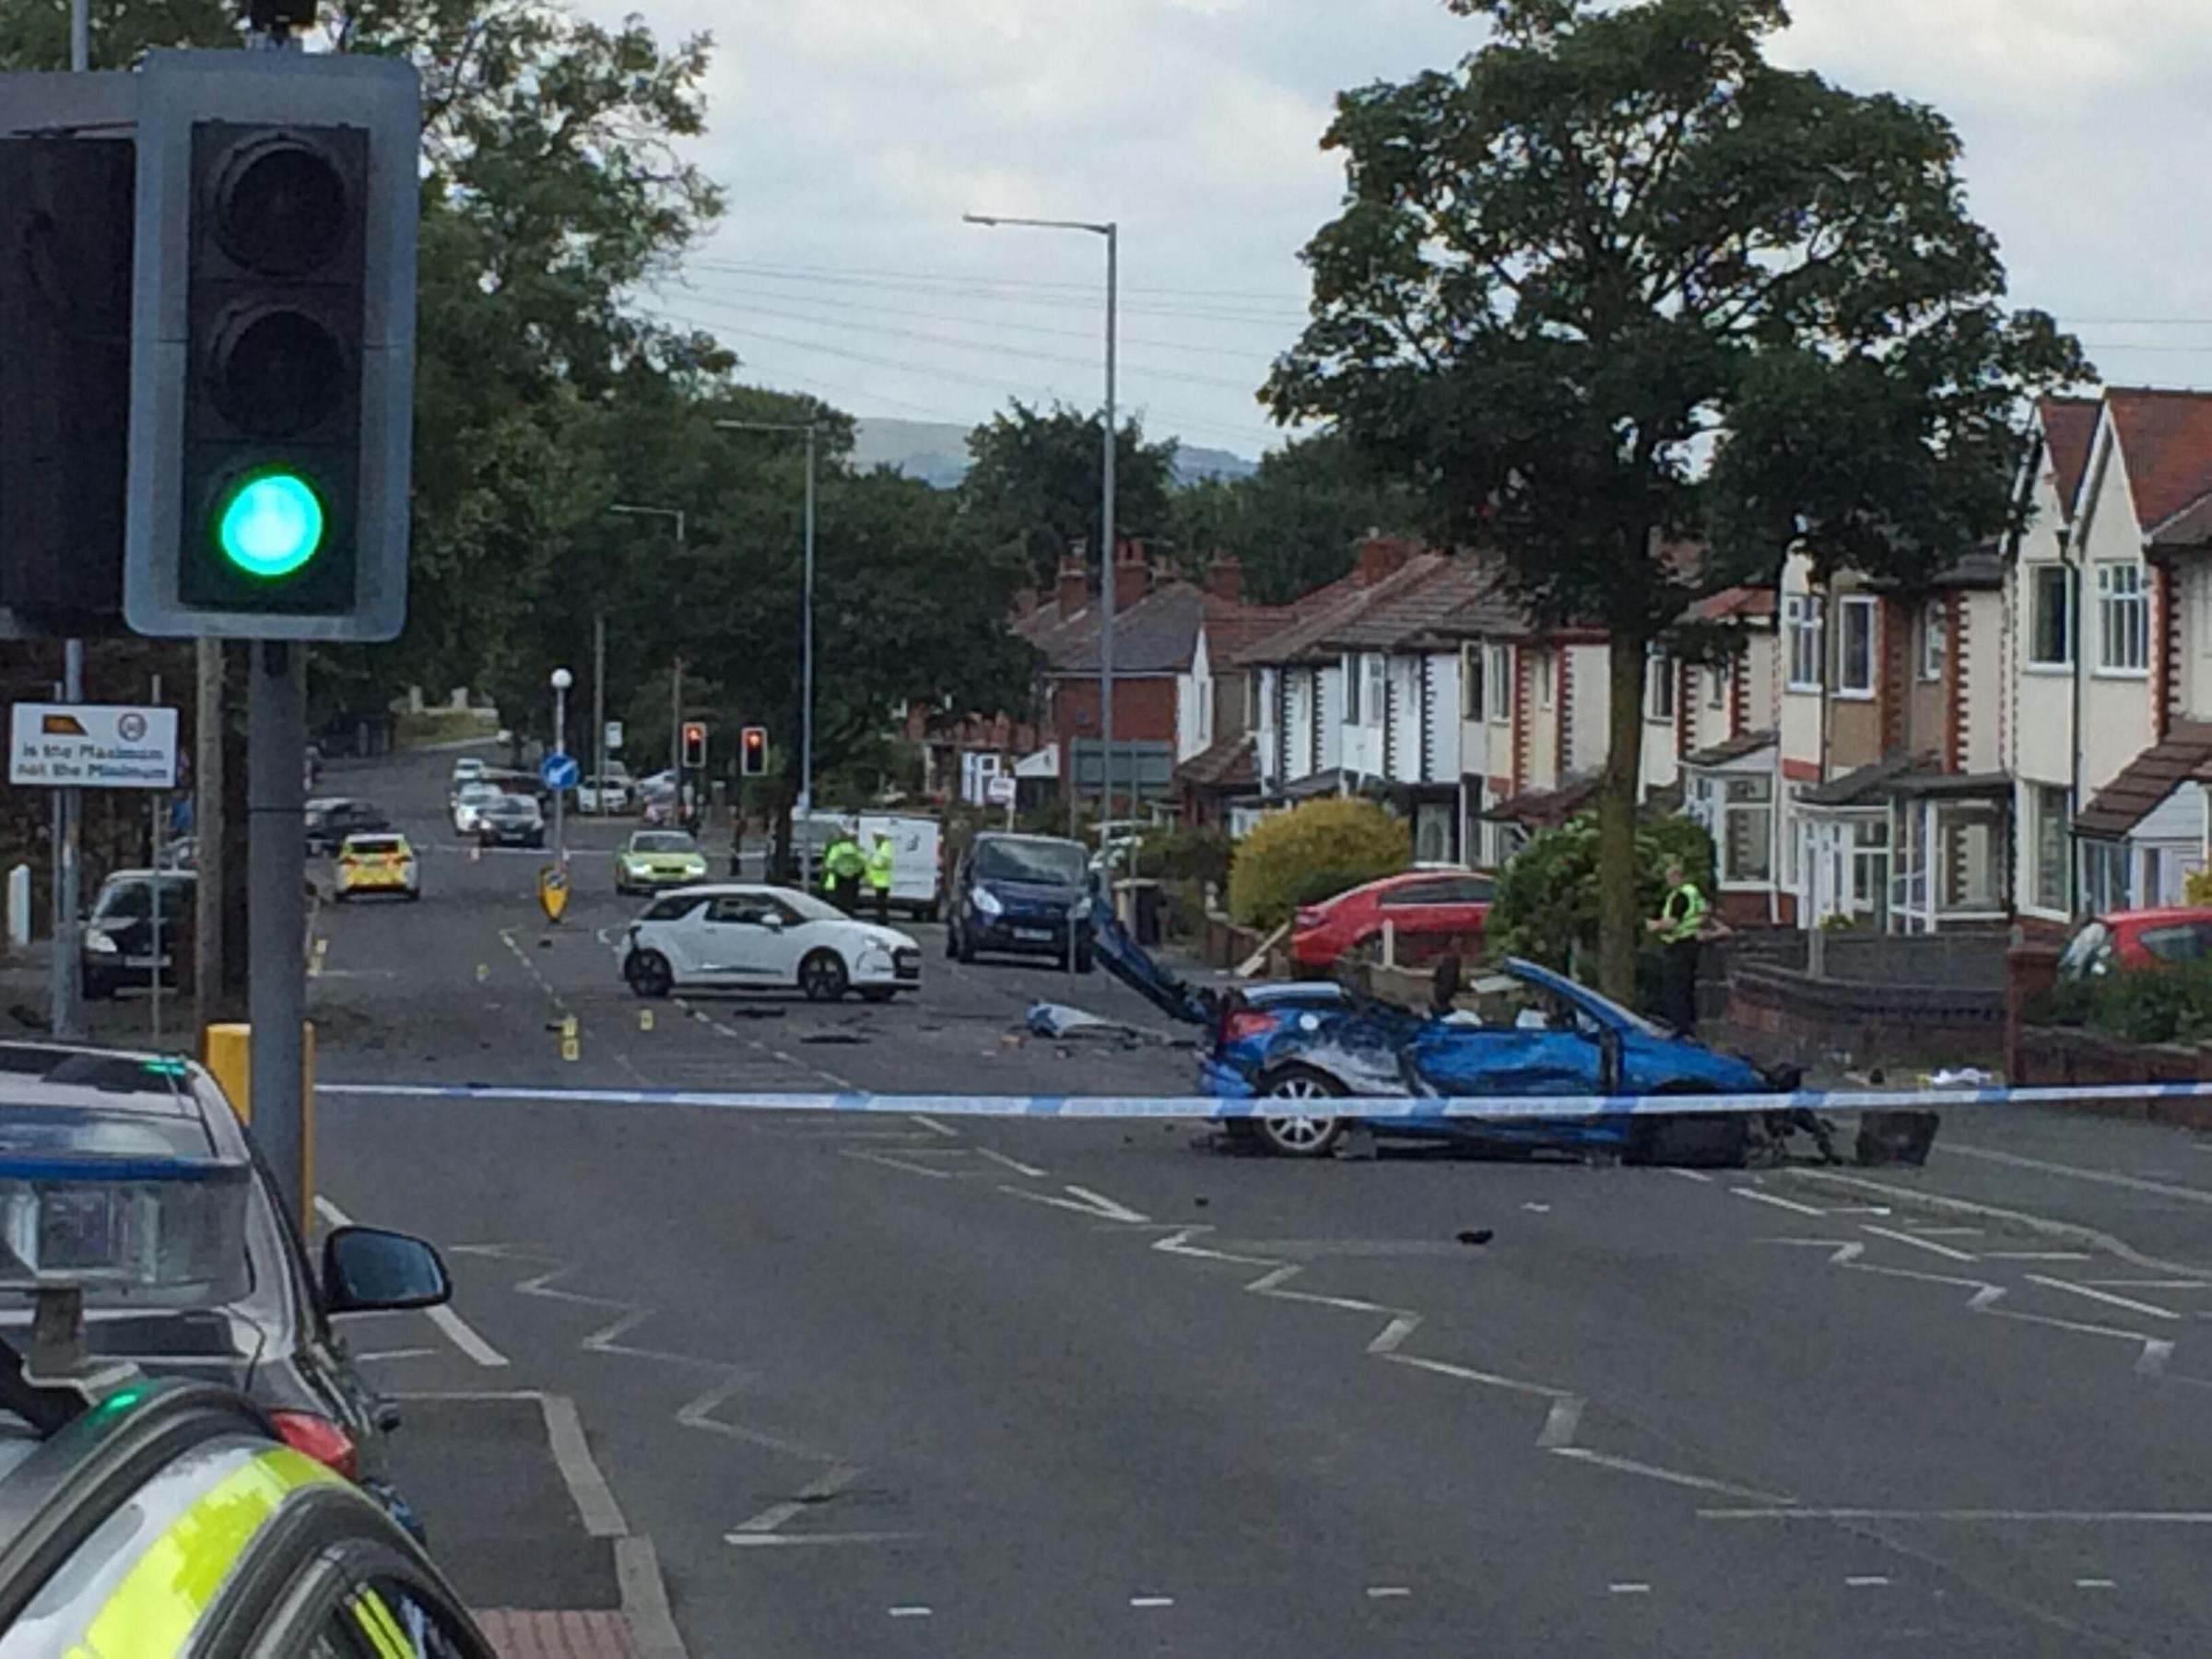 Teens Rushed To Hospital With Major Head Trauma After Crash The